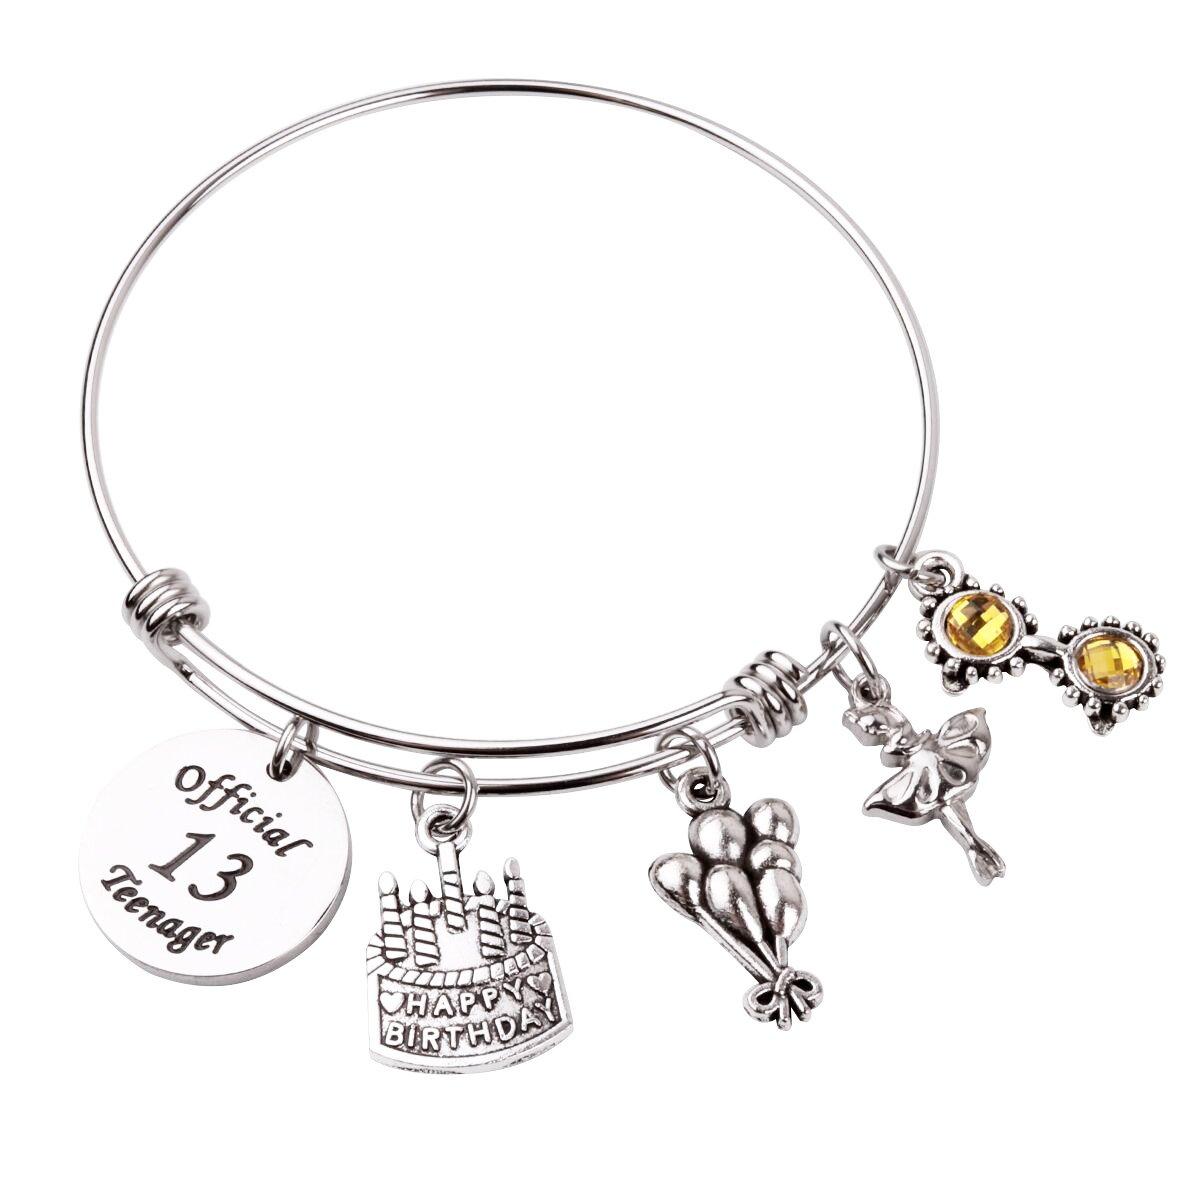 RUNXINTD Birthday Bracelet for Girl Birthday Jewelry Gift for Granddaughter daguhter Niece 13th Sweet 16 18th 21st